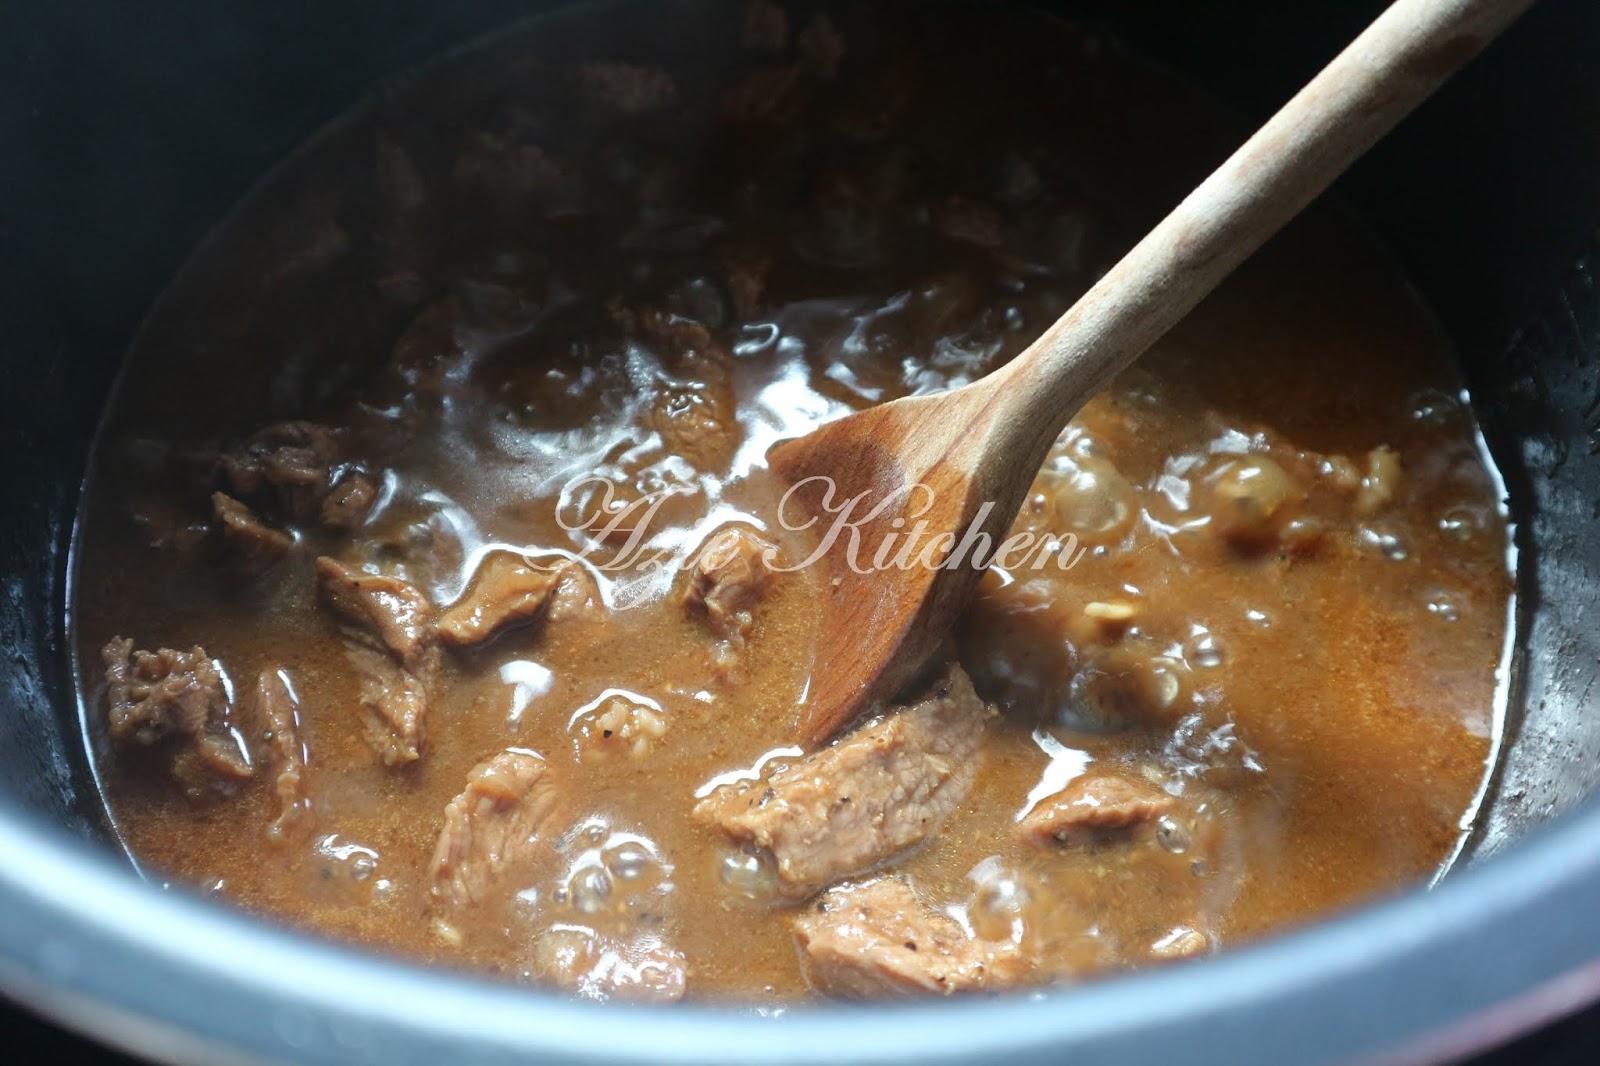 resepi daging black pepper noxxa tersoal Resepi Daging Masak Hitam Periuk Noxxa Enak dan Mudah